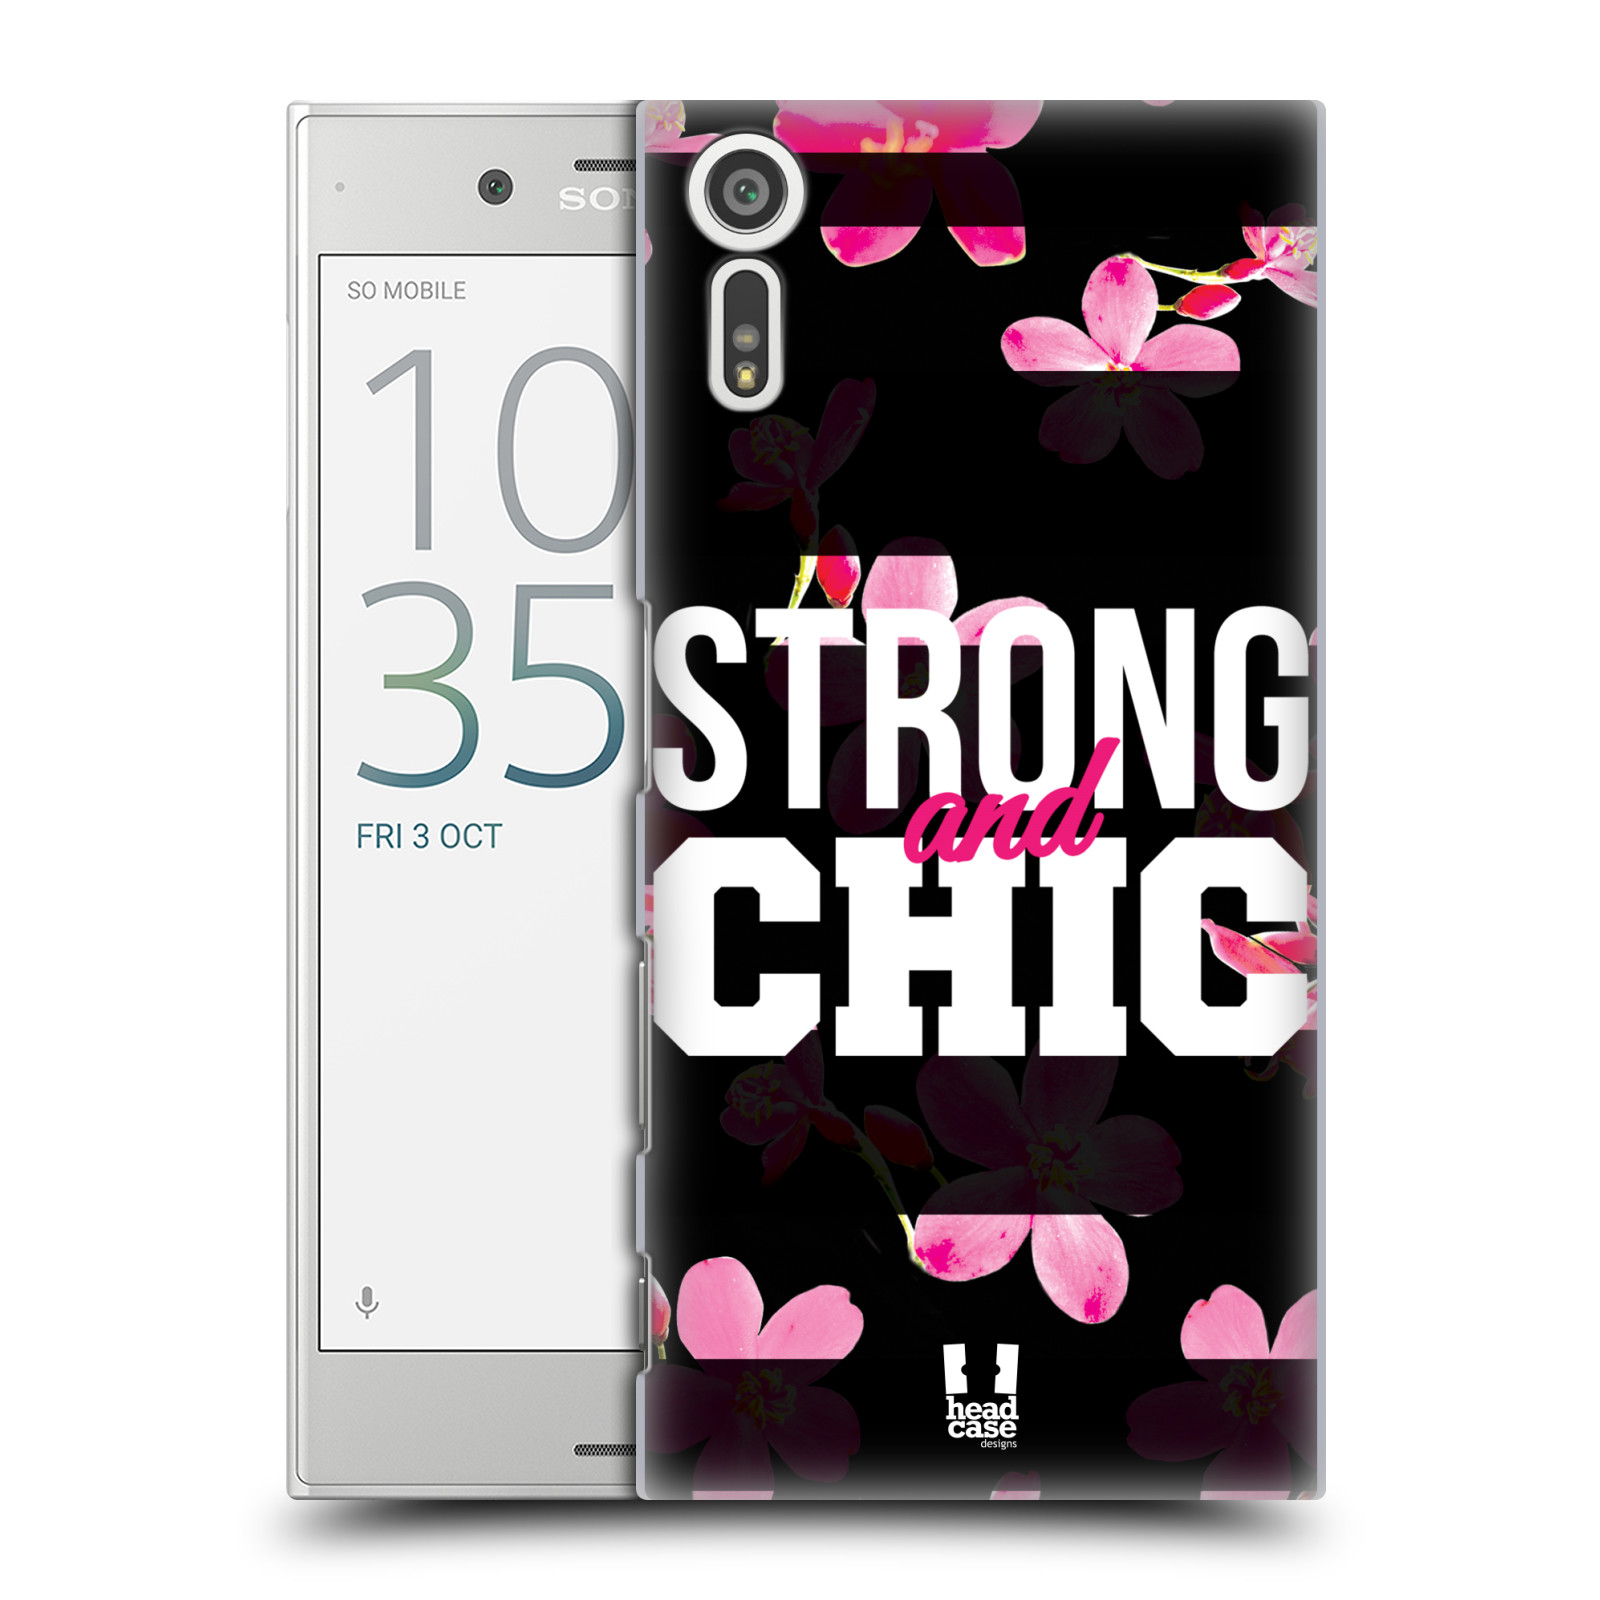 HEAD CASE plastový obal na mobil Sony Xperia XZ Sportovní nápisy STRONG and CHIC